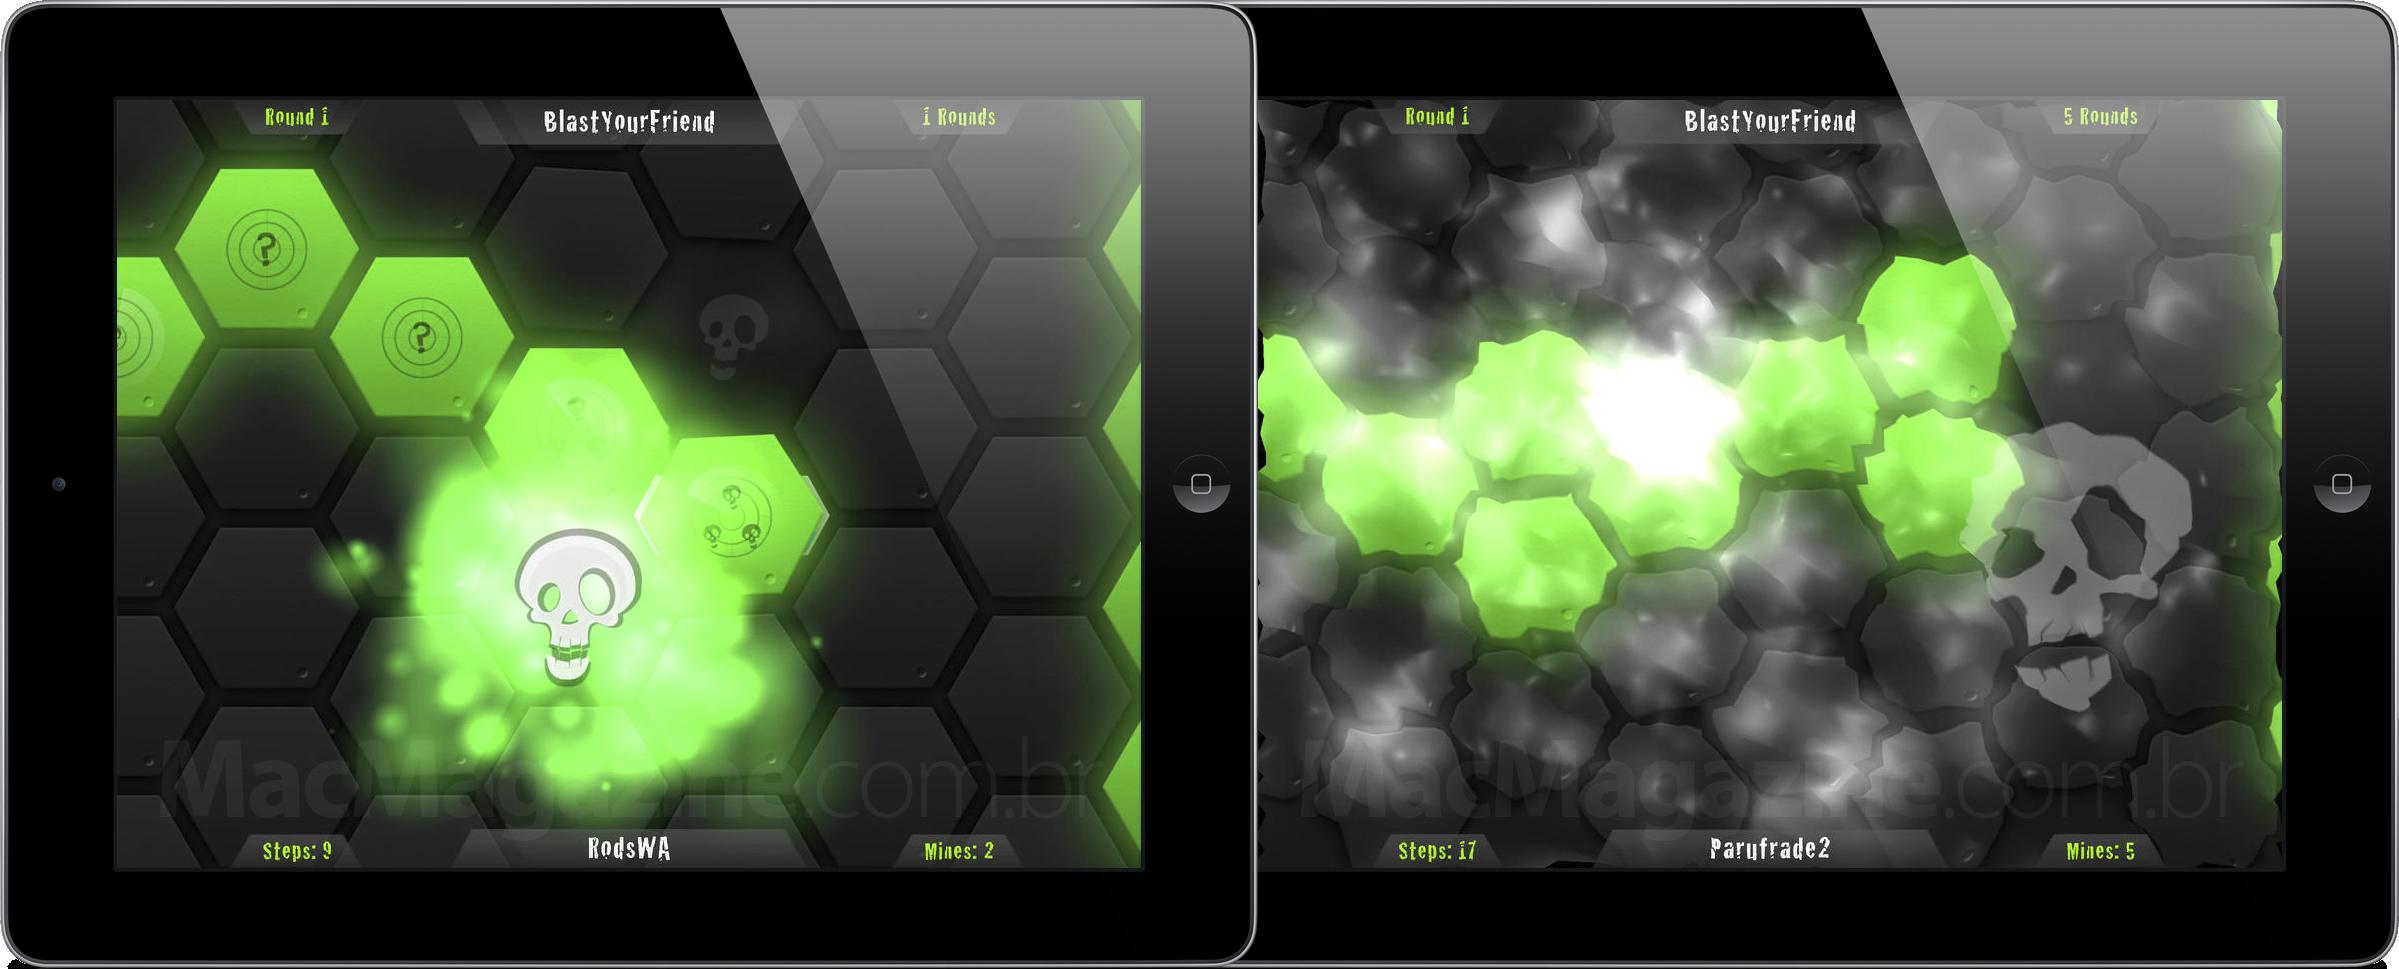 Jogo BlastYourFriend para iPads